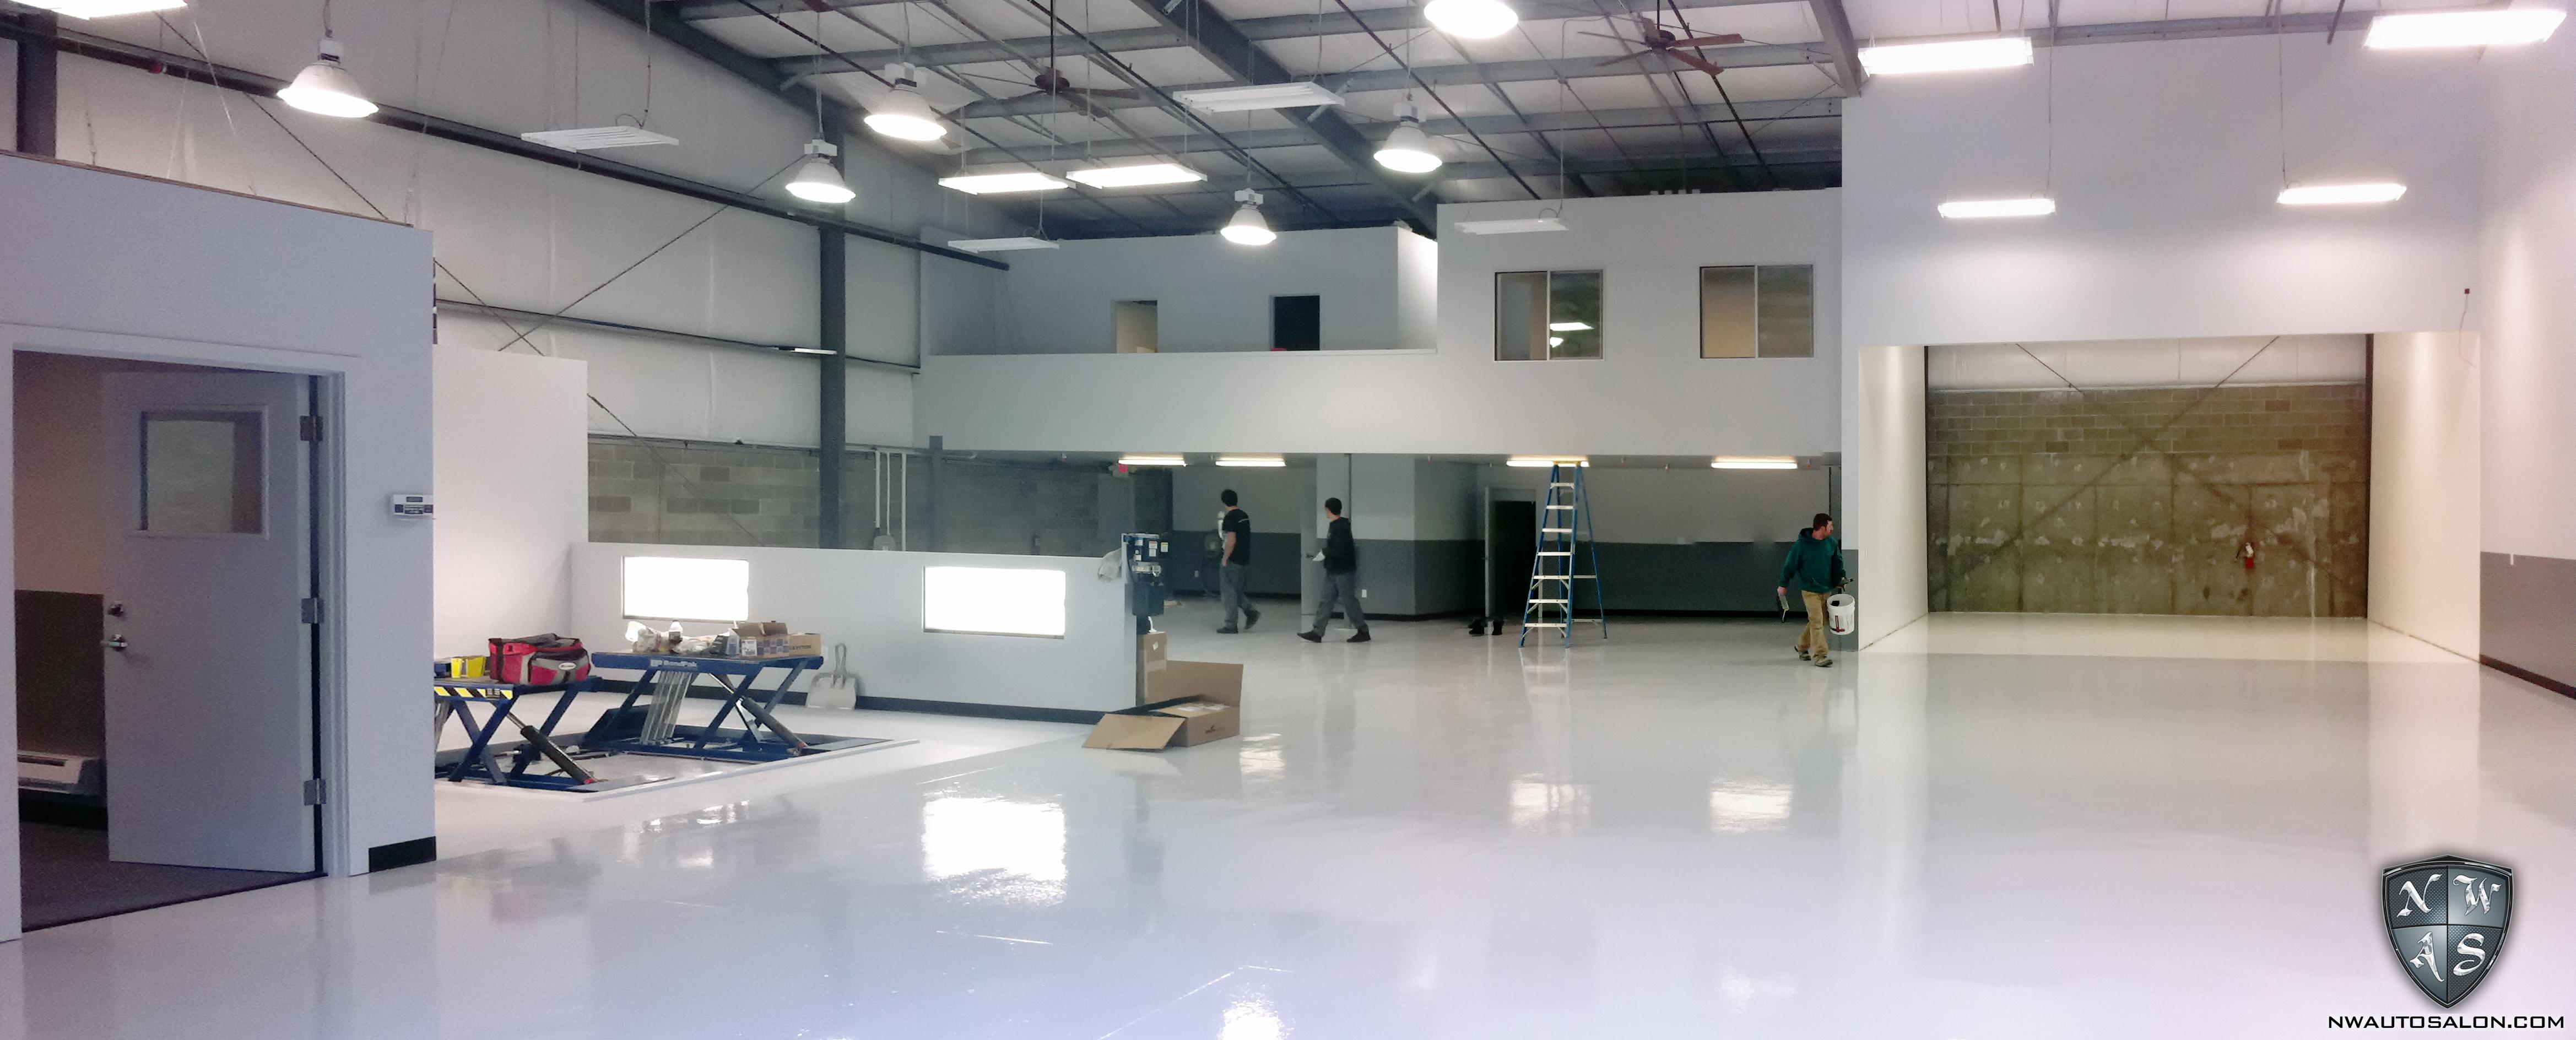 final build progress photos of northwest auto salon s new. Black Bedroom Furniture Sets. Home Design Ideas